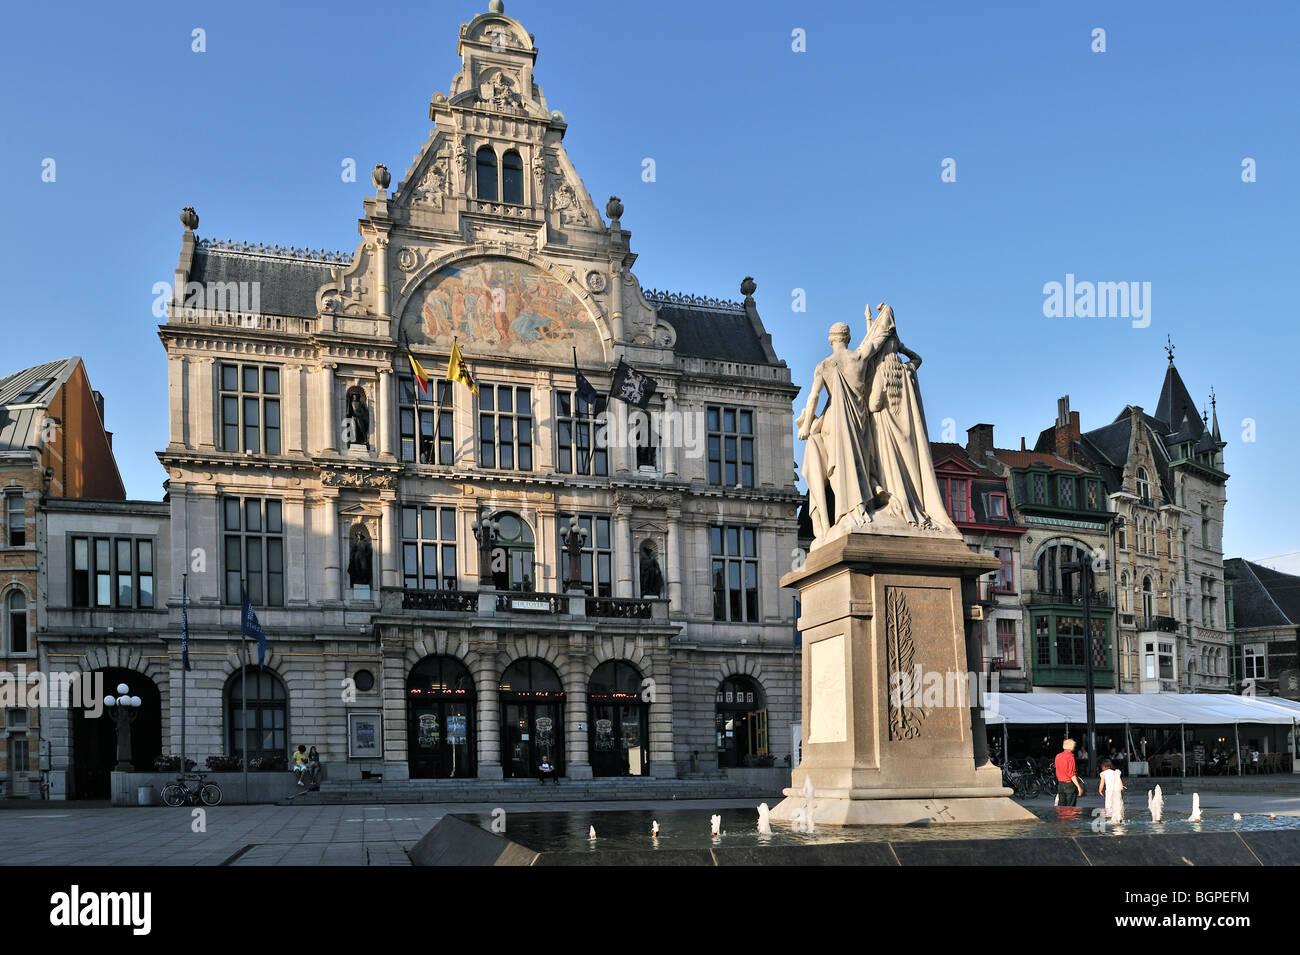 The theatre Koninklijke Nederlandse Schouwburg at the Saint-Bavo's square, Ghent, Belgium - Stock Image